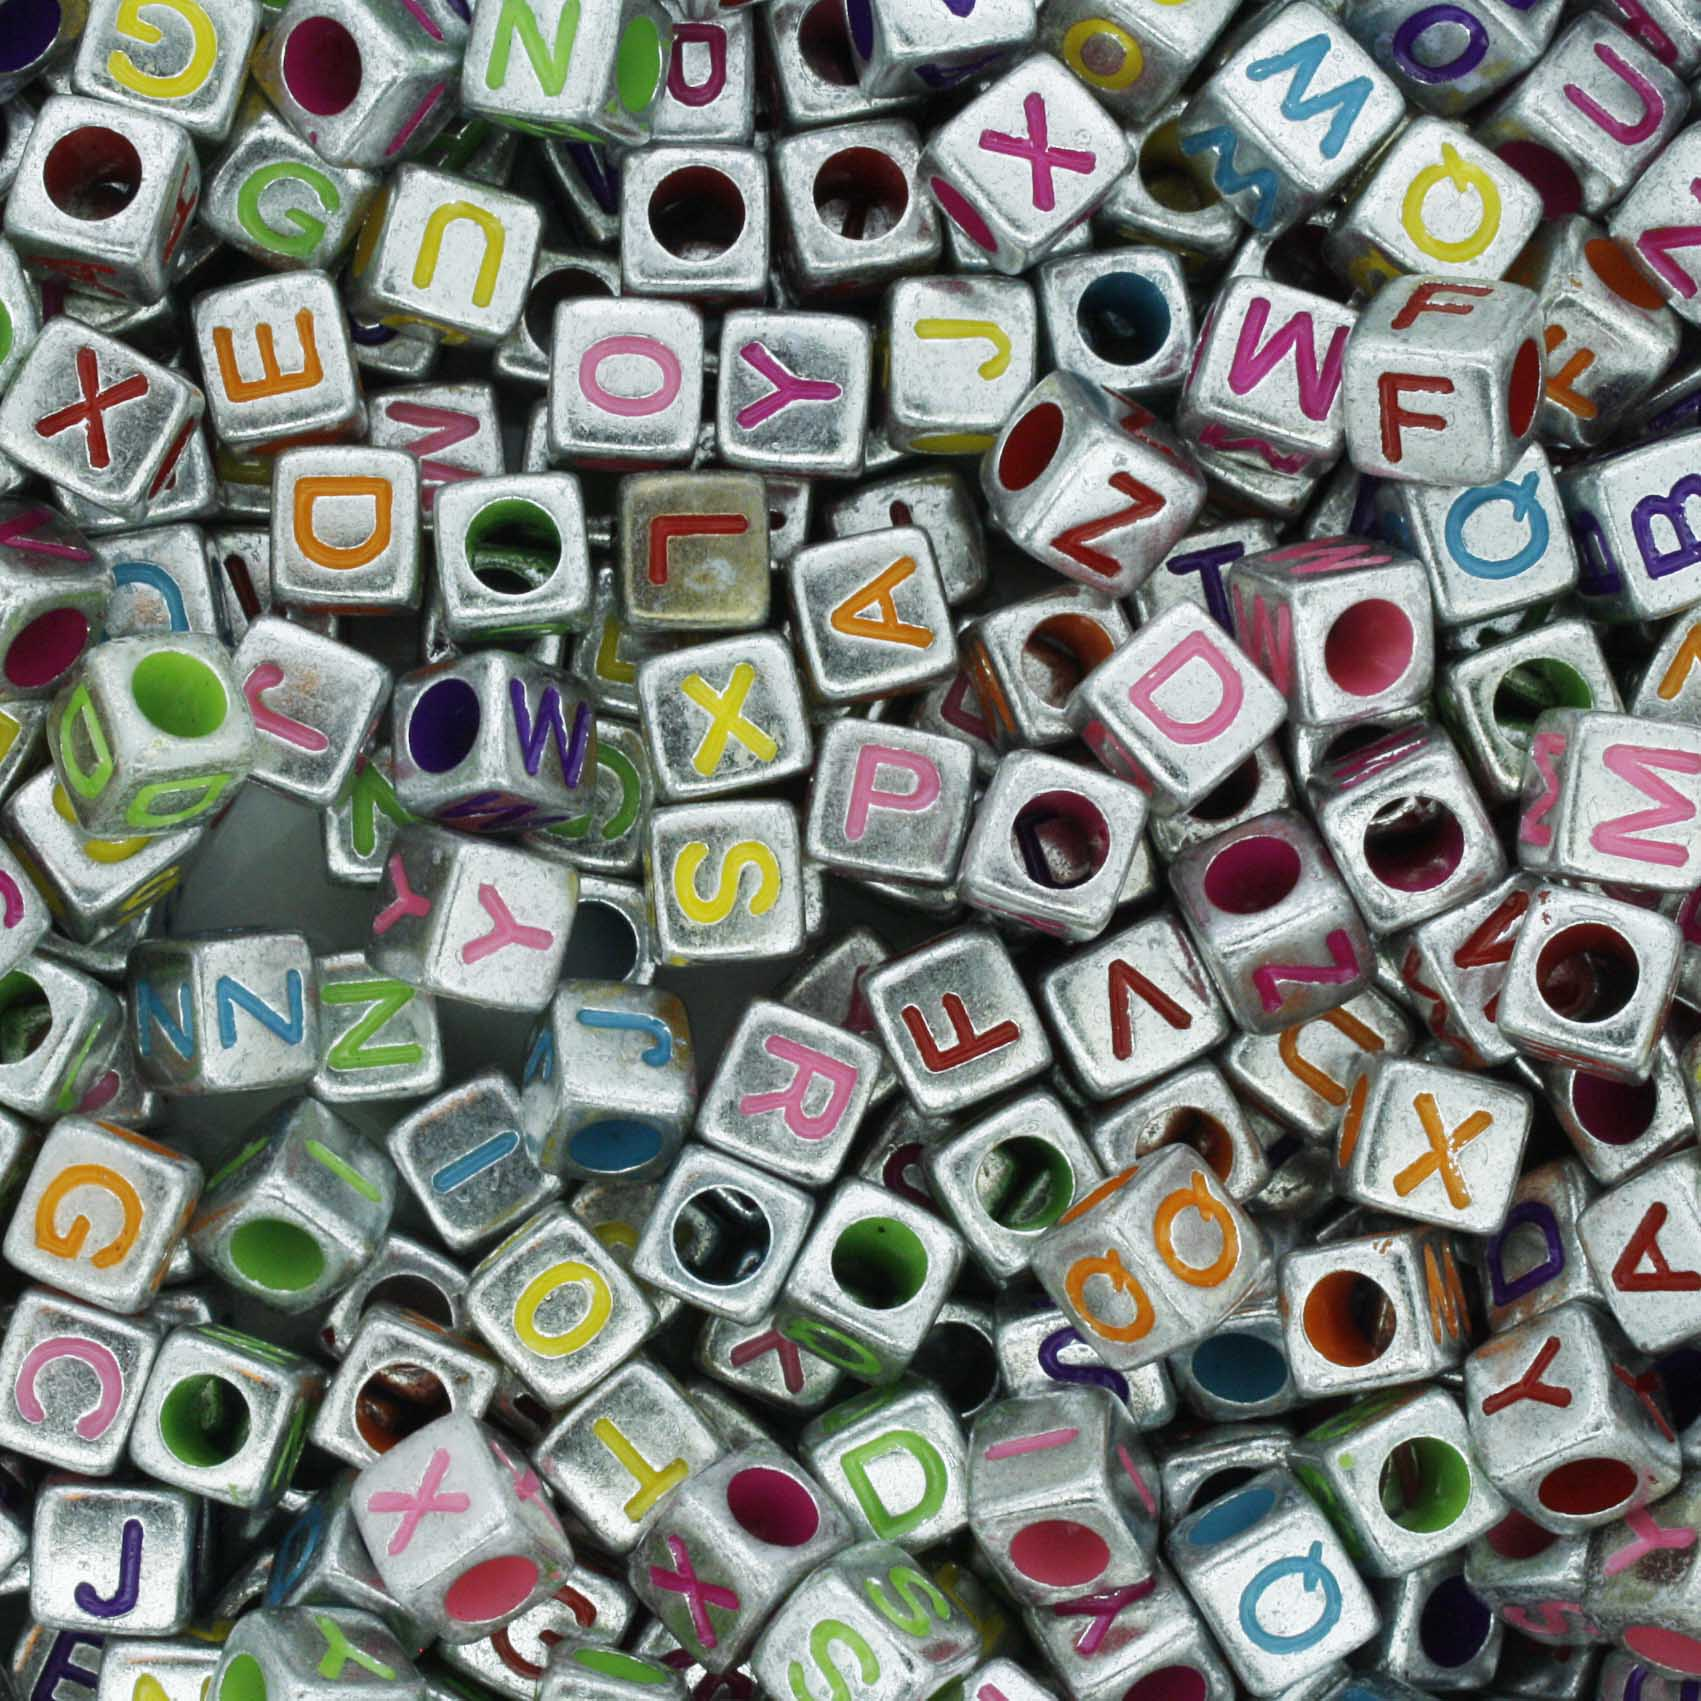 Miçanga - Letras Cubo Prateada Colors  - Stéphanie Bijoux® - Peças para Bijuterias e Artesanato